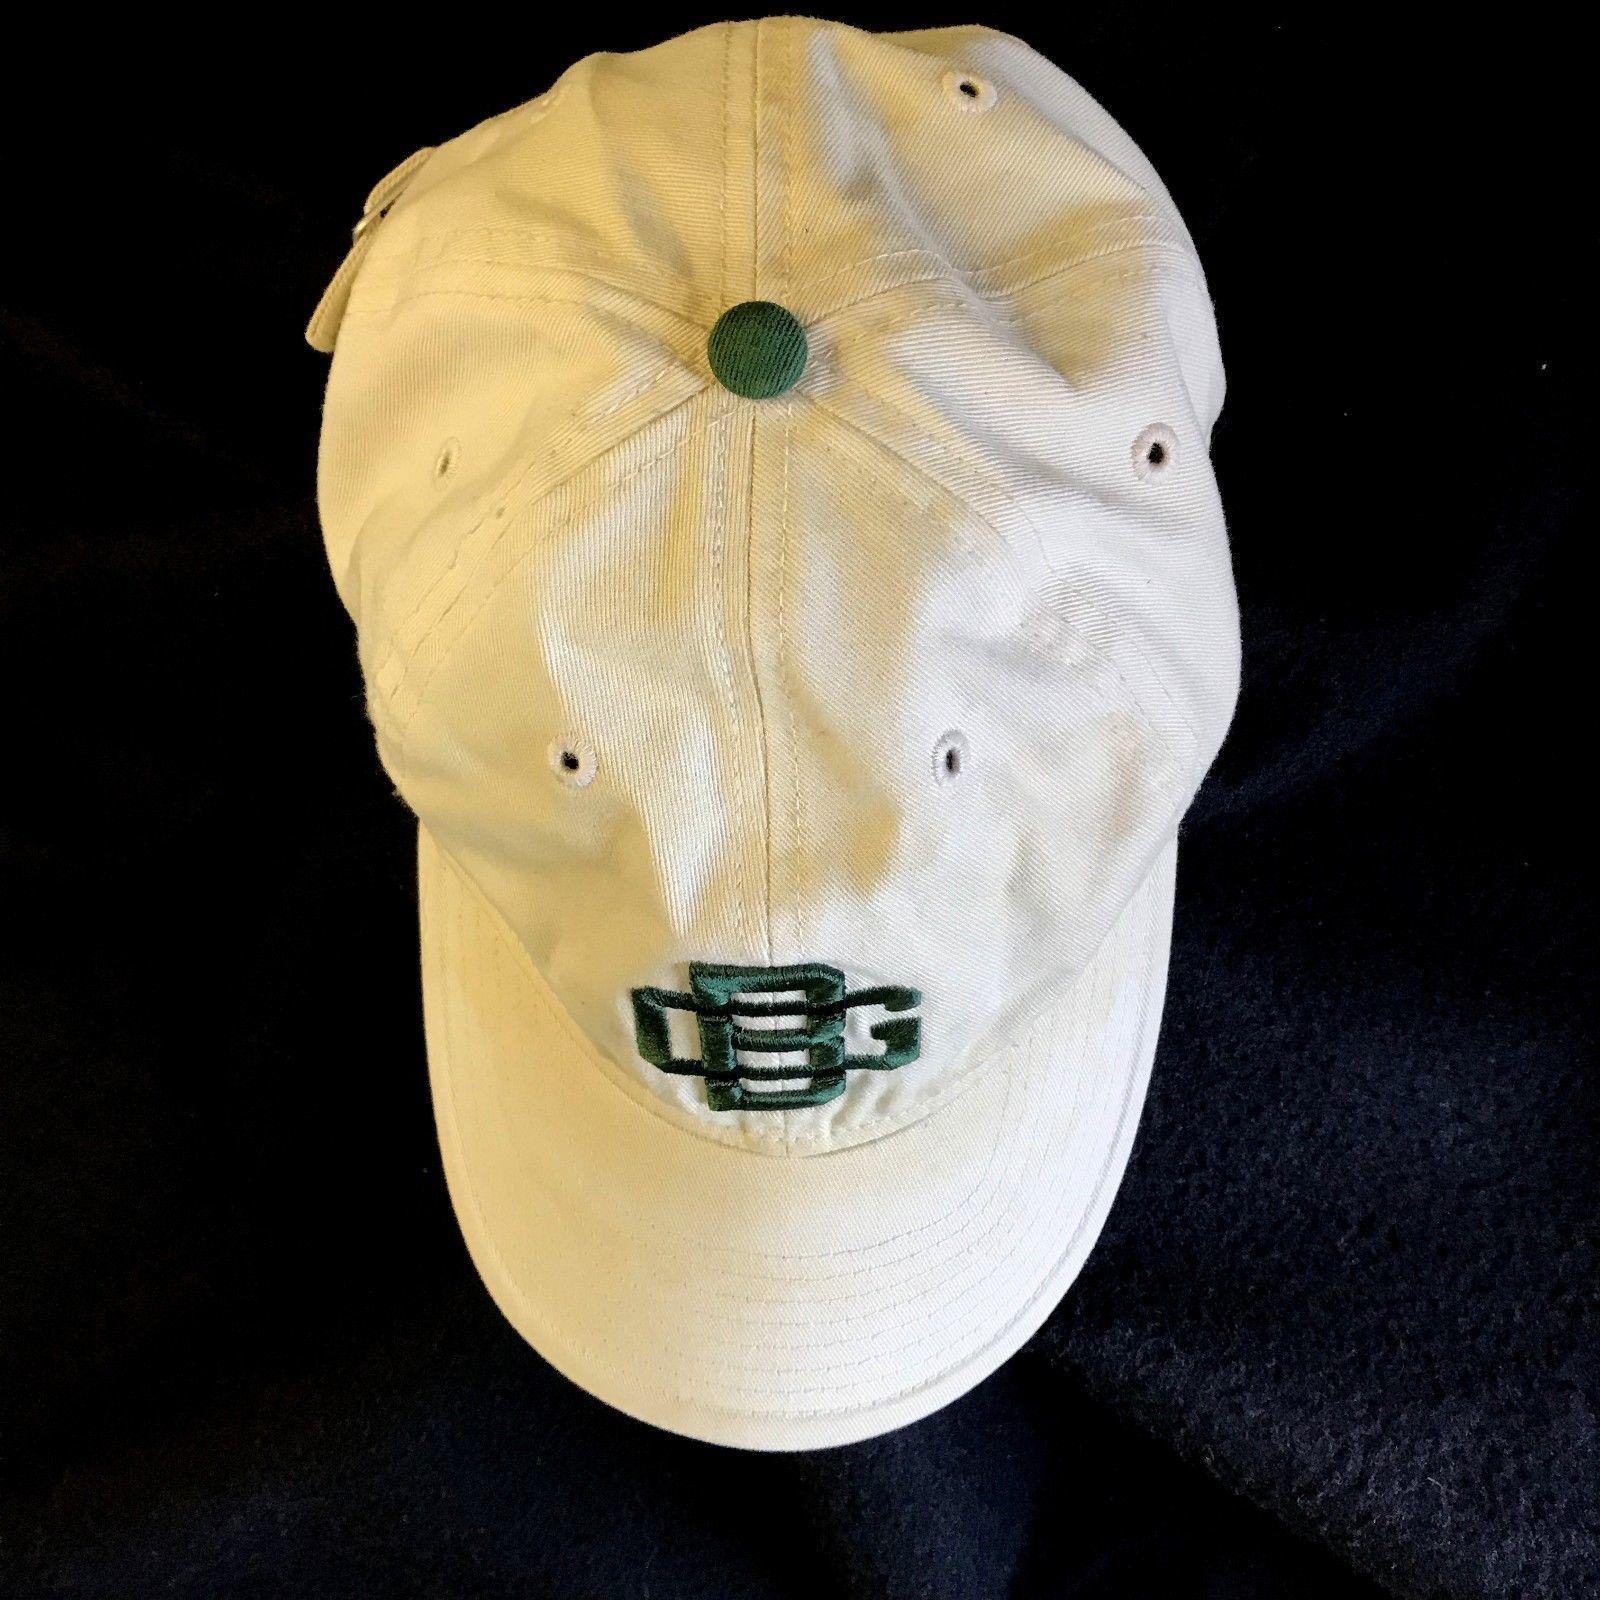 7383d45d8ba Retro Green Bay Packers 1956 Vtg GB Logo Beige Ball Cap Adjustable Snap  Buckle